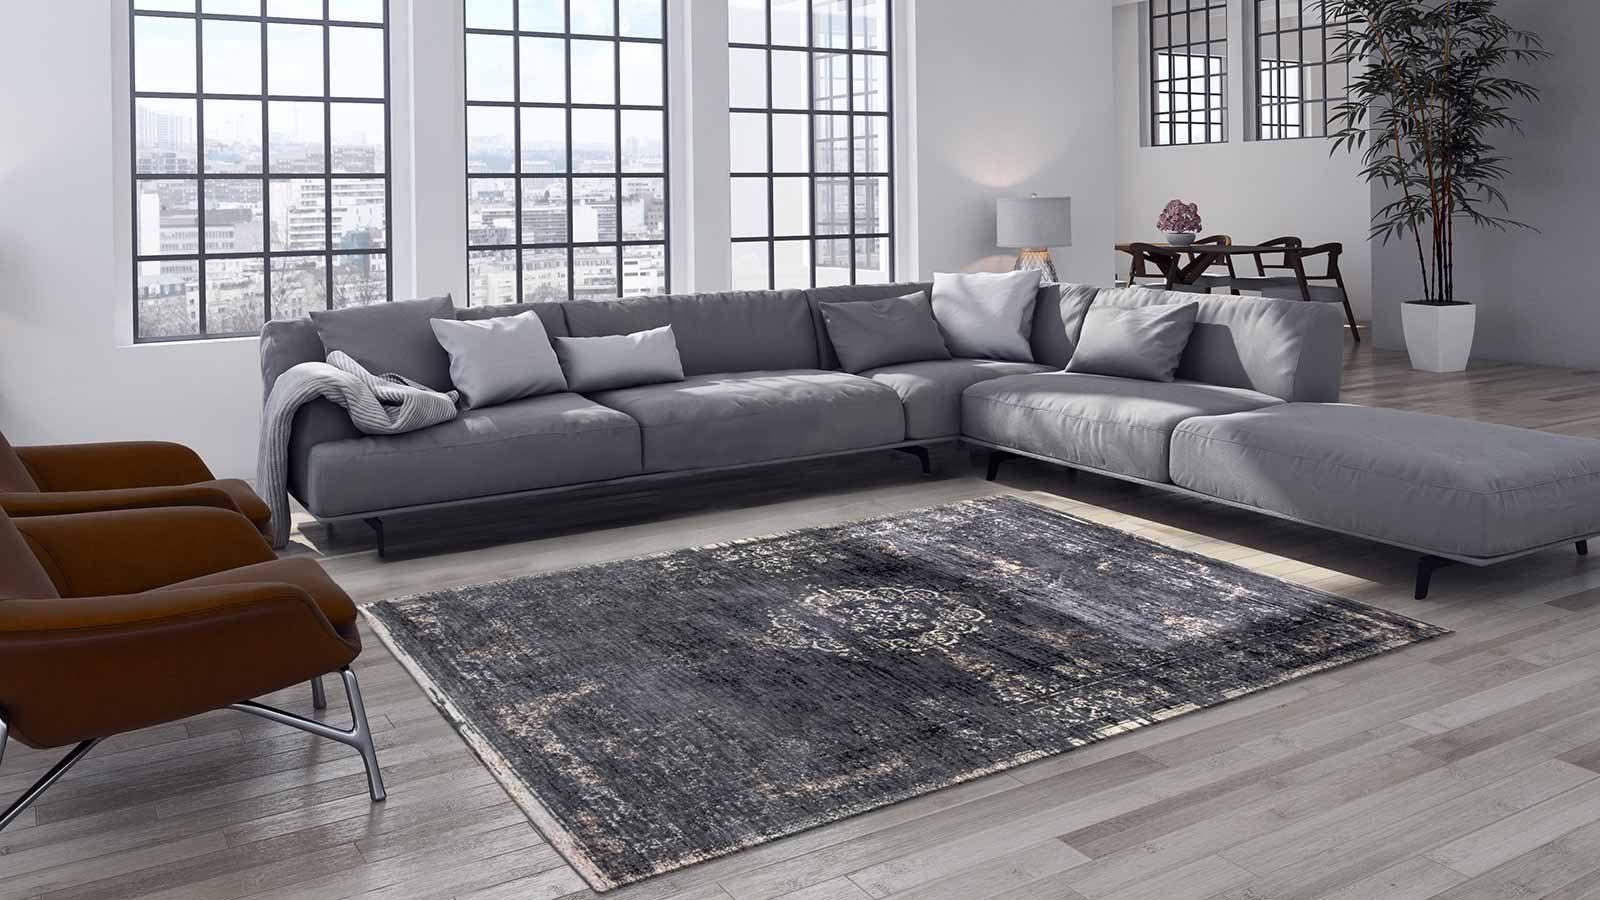 alfombras Louis De Poortere LX8263 Fading World Medaillon Mineral Black interior 2